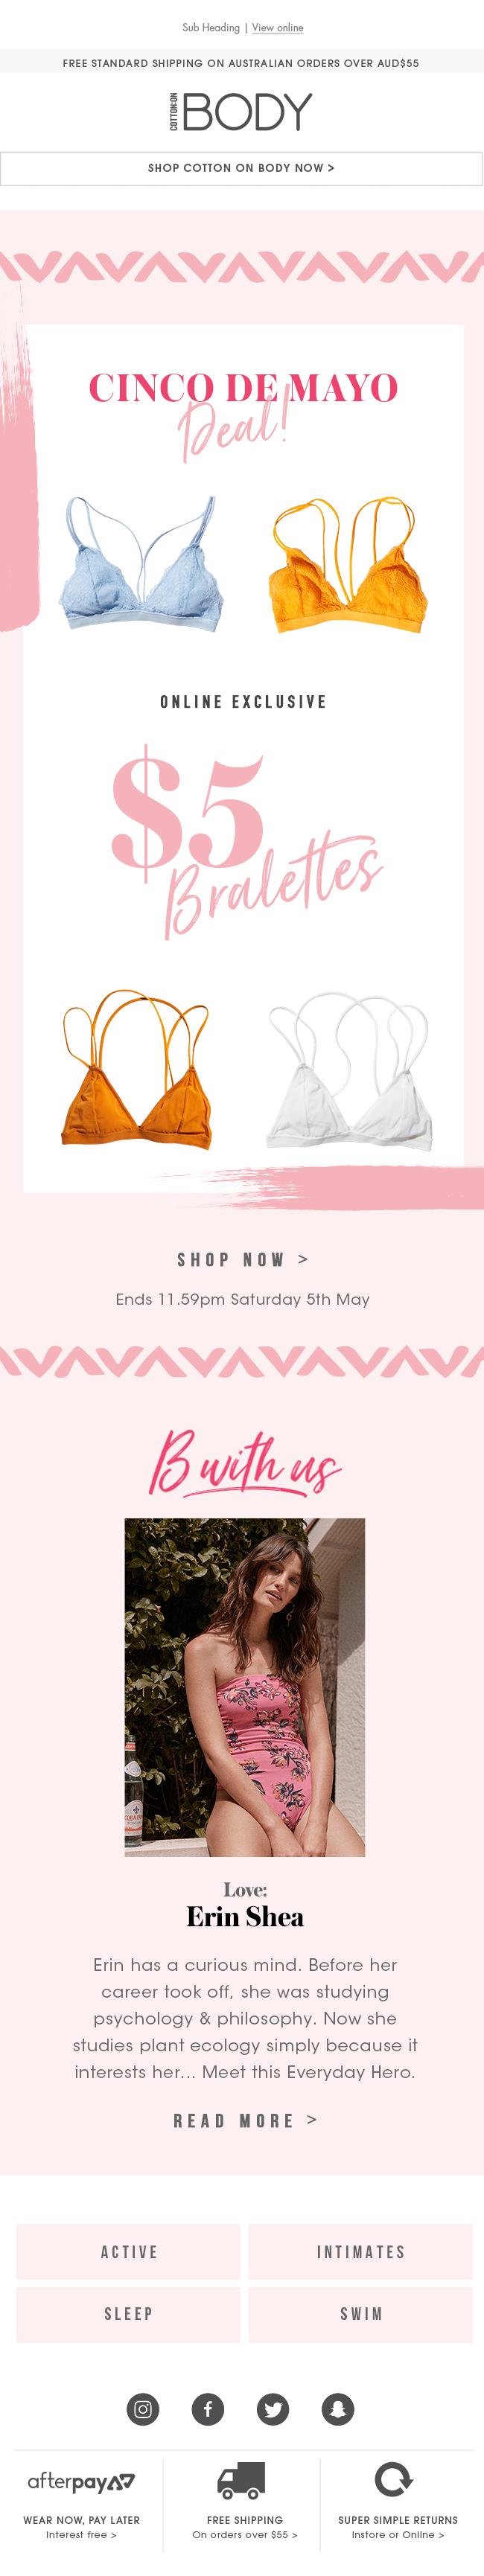 Lauren-Louisa-Graphic-Design-Work-Cotton-On-Body-2.jpg